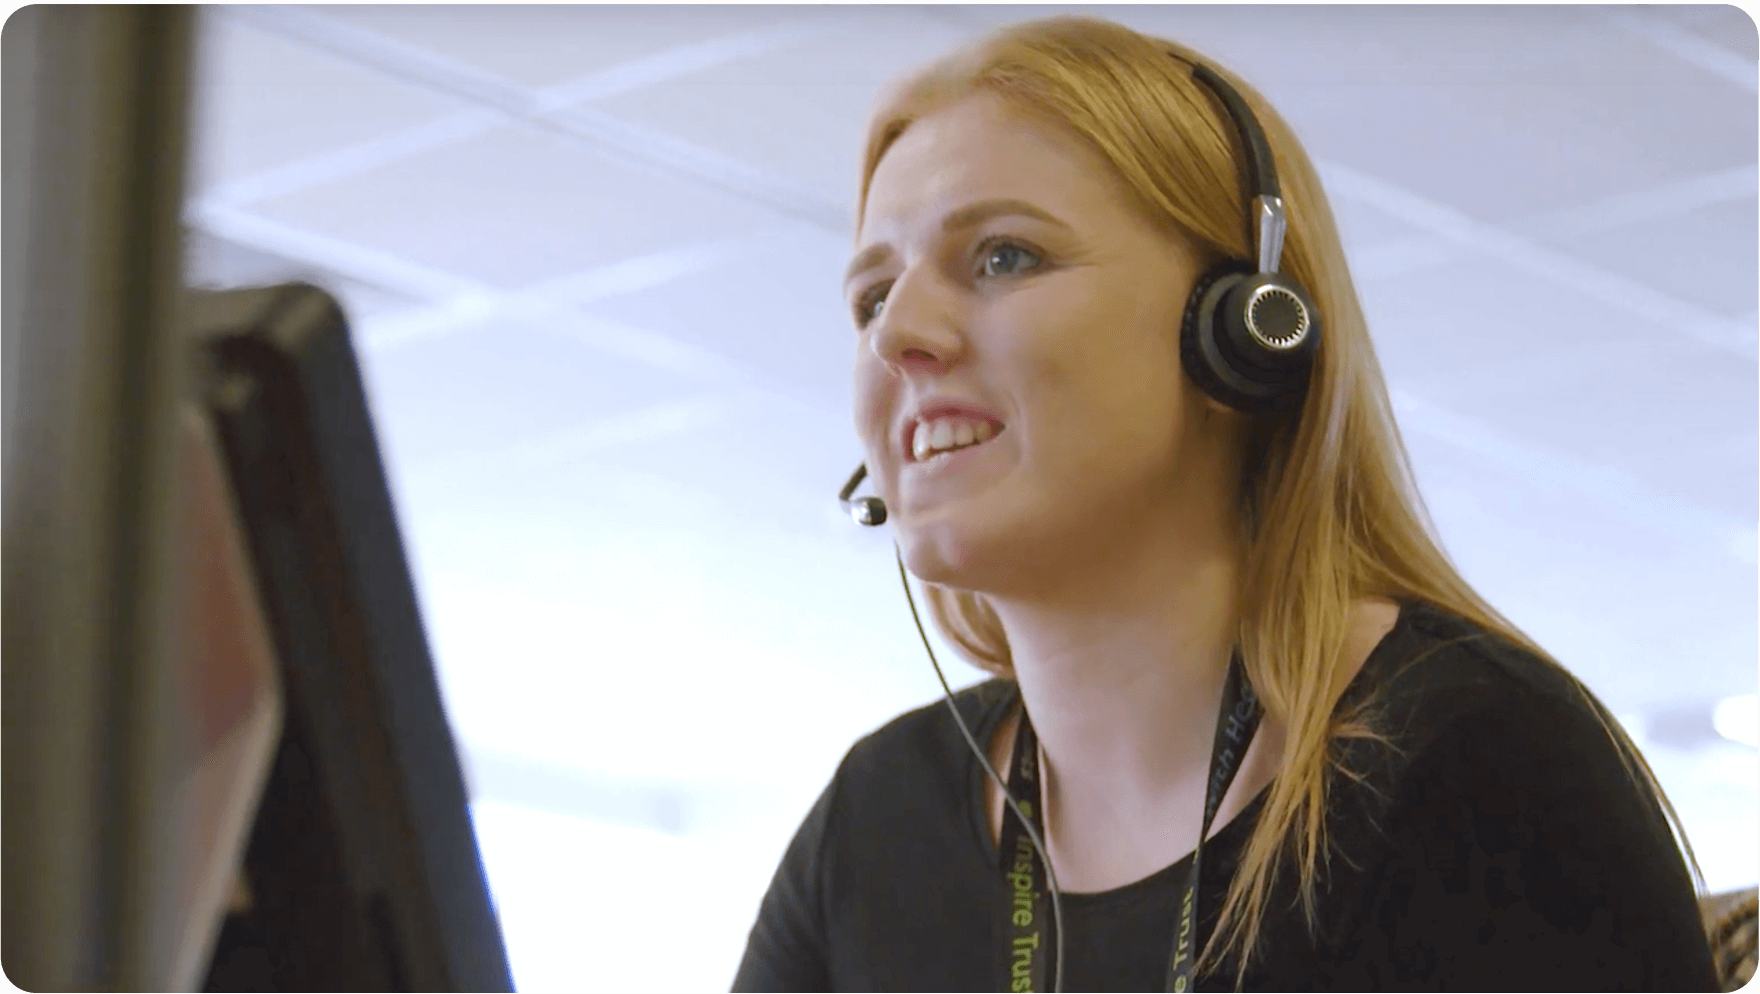 LV Jobs - Careers Website - Video Thumbnail - Croydon Image.png